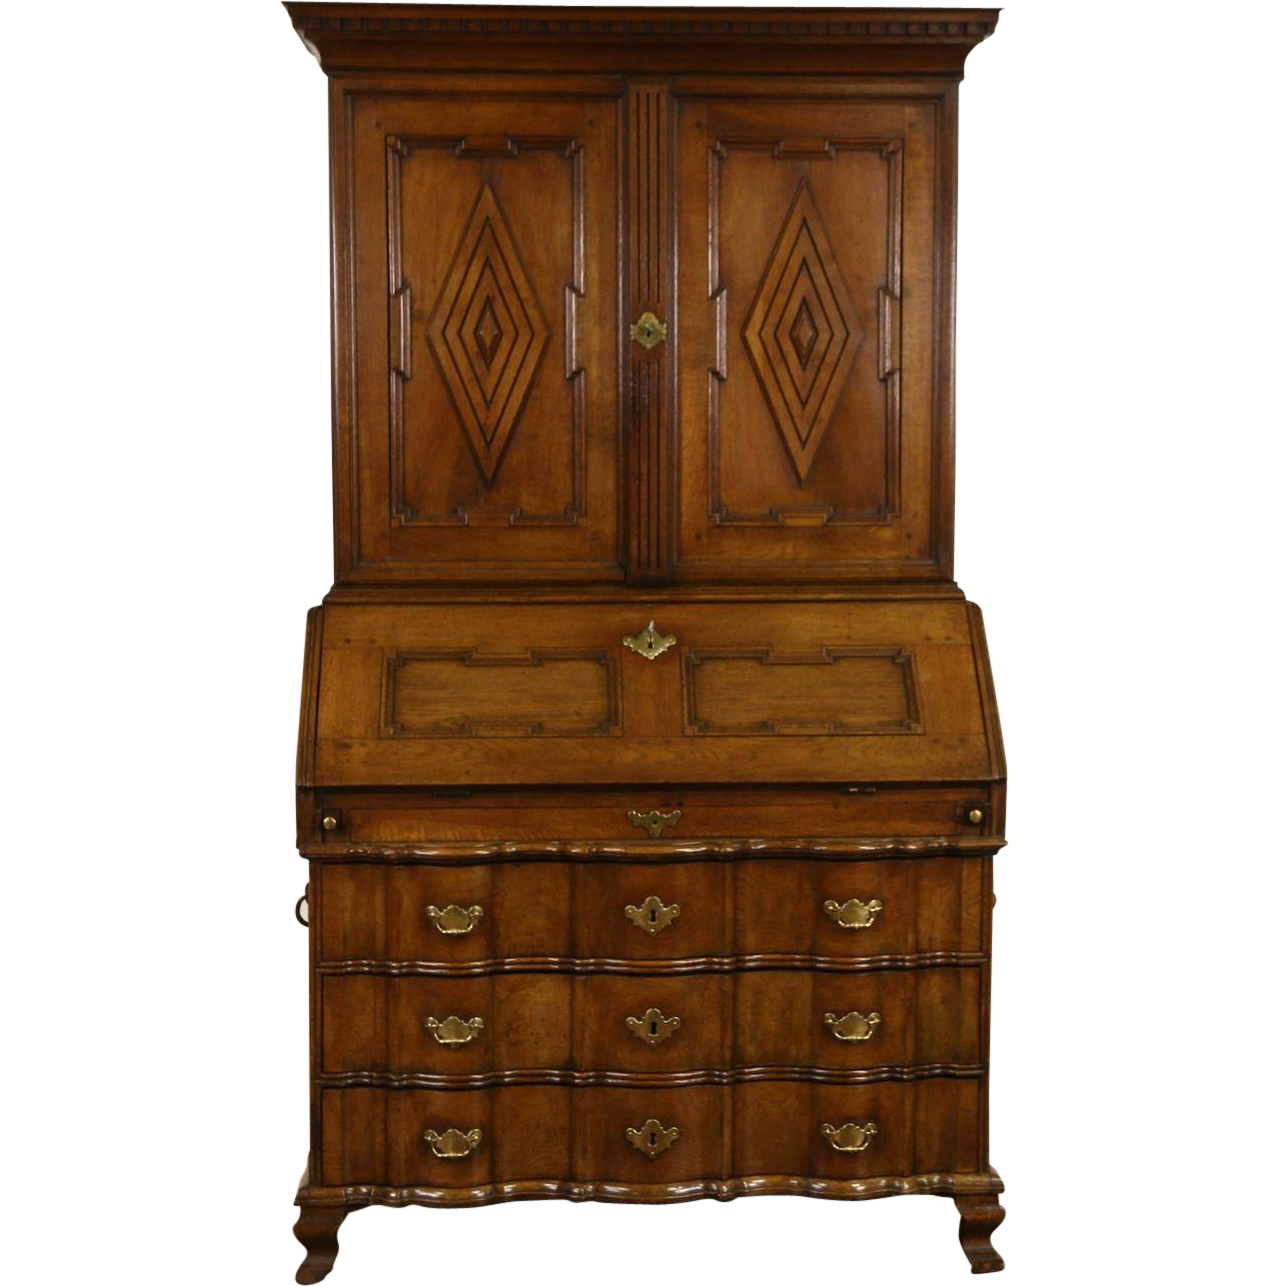 Oak Carved 1790's Antique Secretary Desk & Bookcase, Denmark